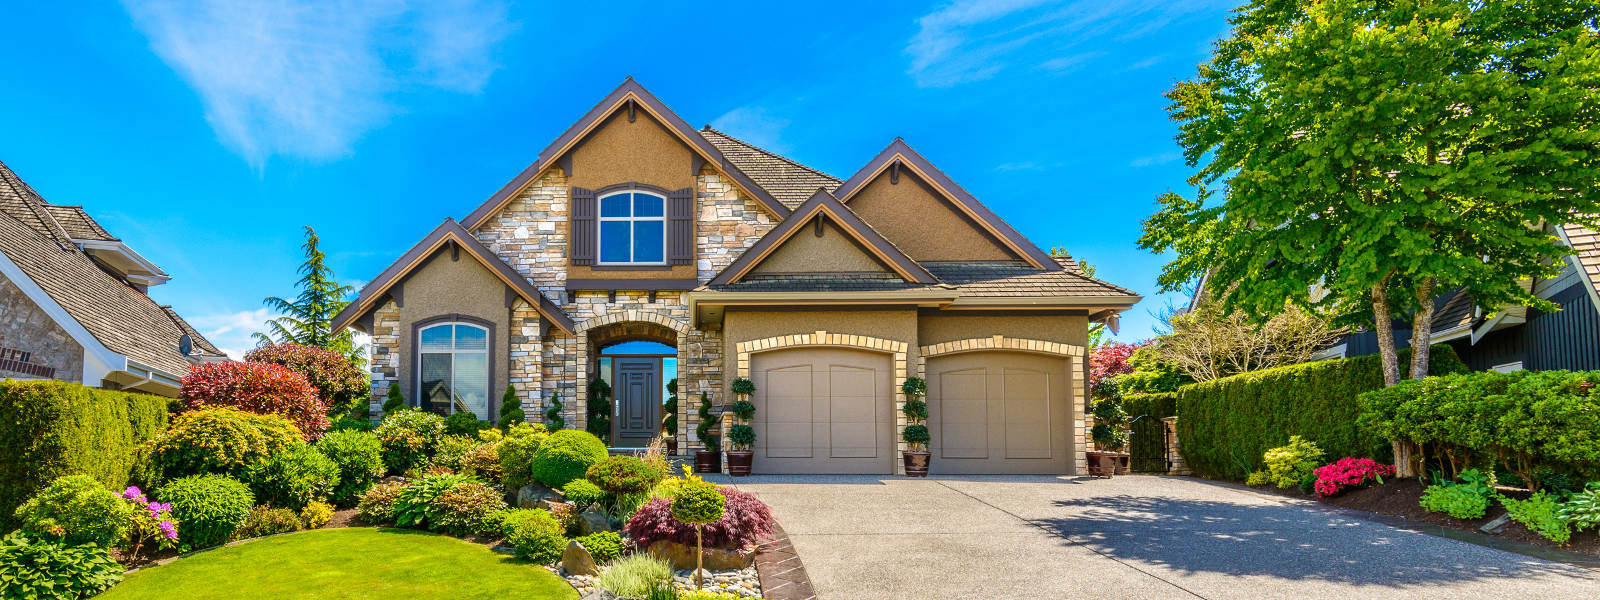 Middle <b>Tennessee</b> Real Estate - <b>Homes</b> for Sale in Murfreesboro <b>TN</b>